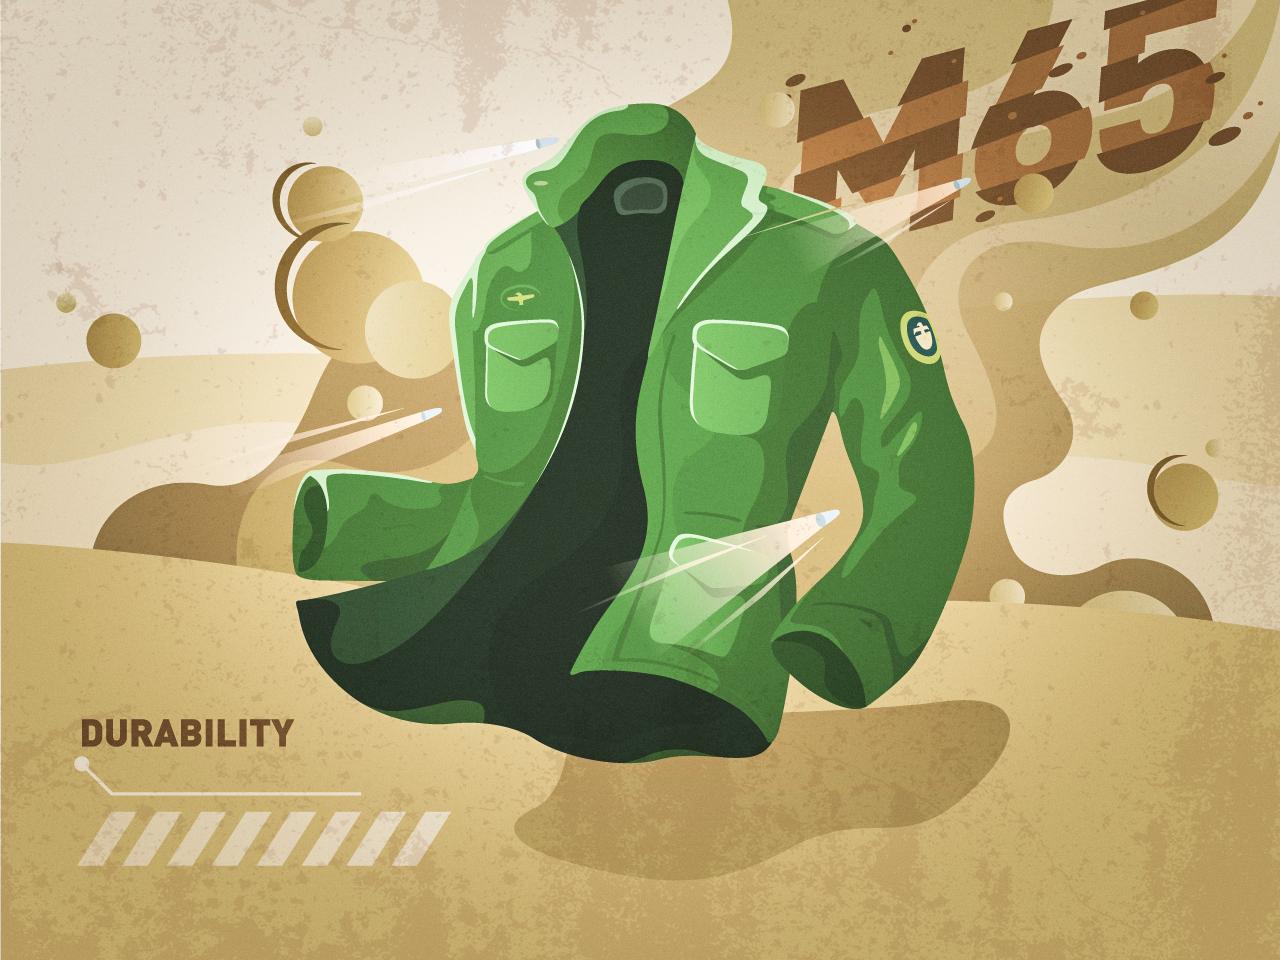 M65 JACKET !!! smog bullet desert m65 jacket clothes player flat illustration